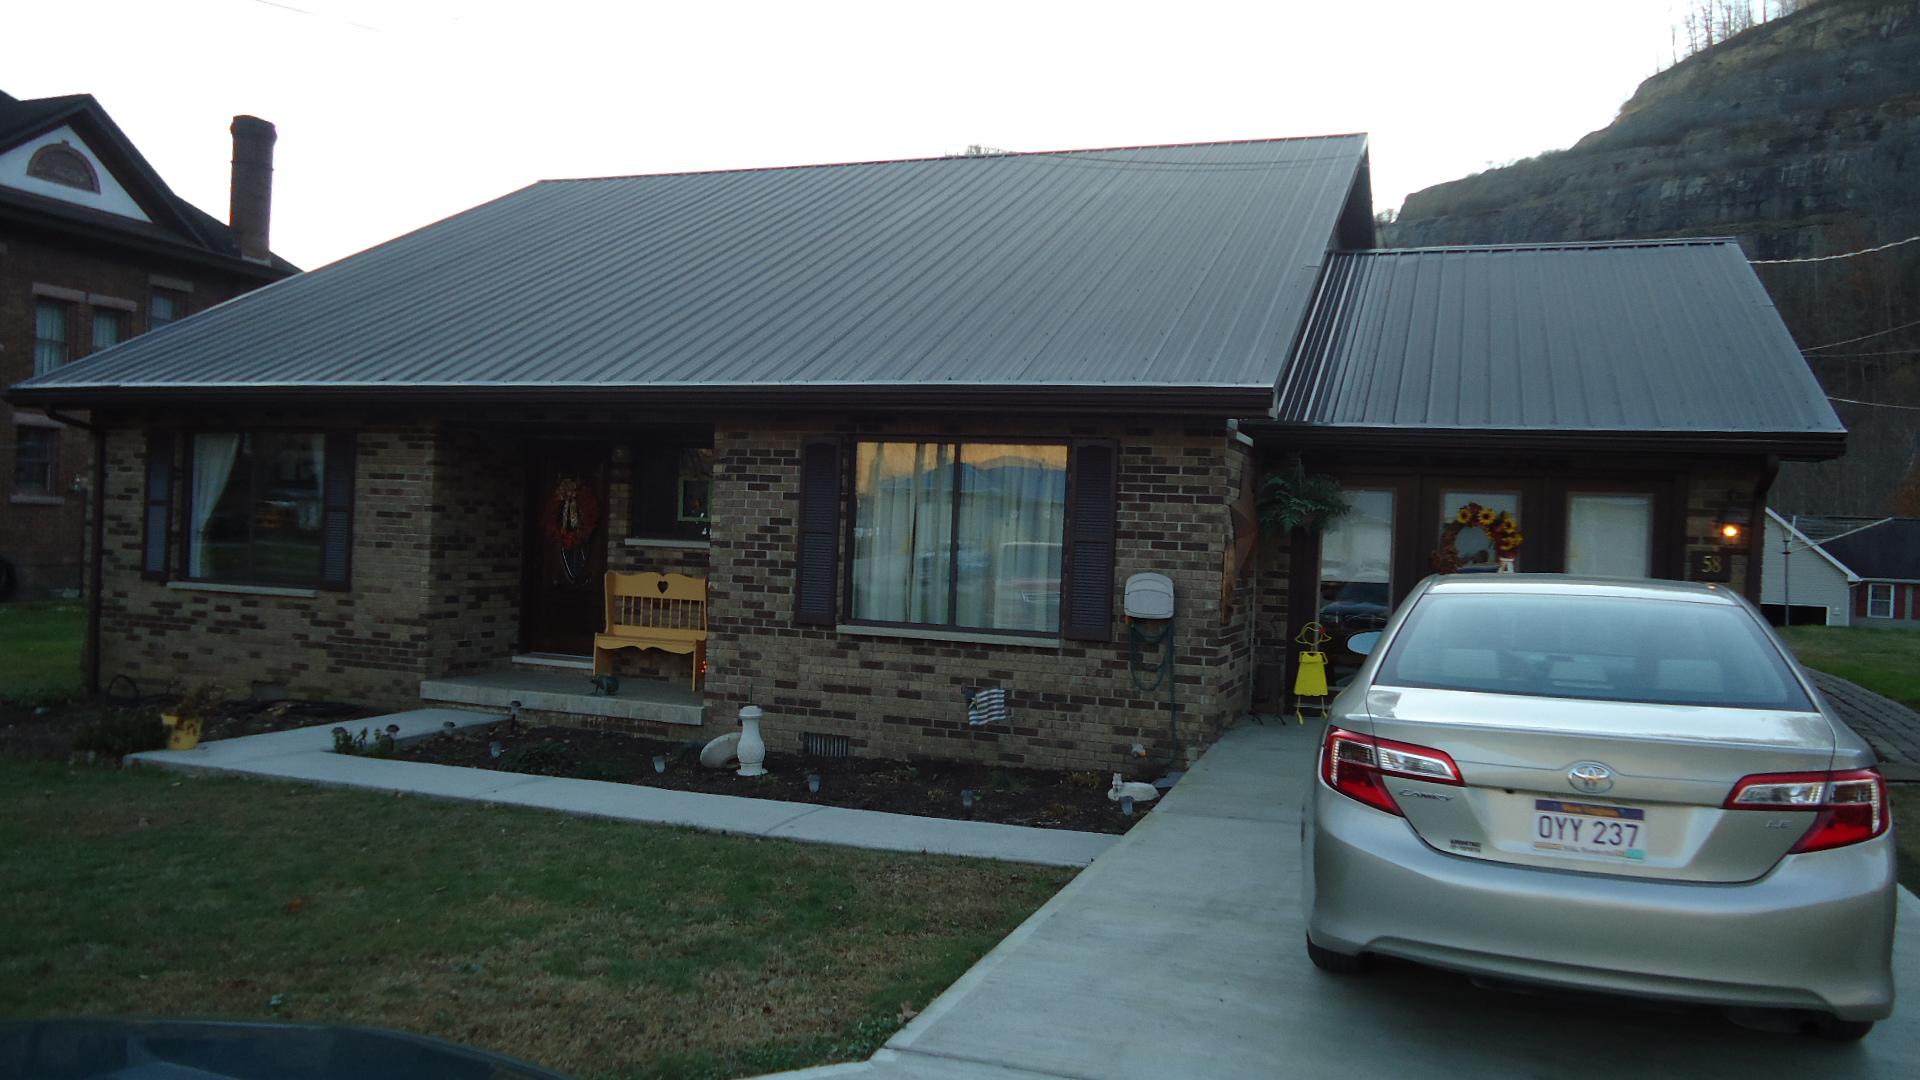 58 River Rock Way, Stollings, West Virginia 25646